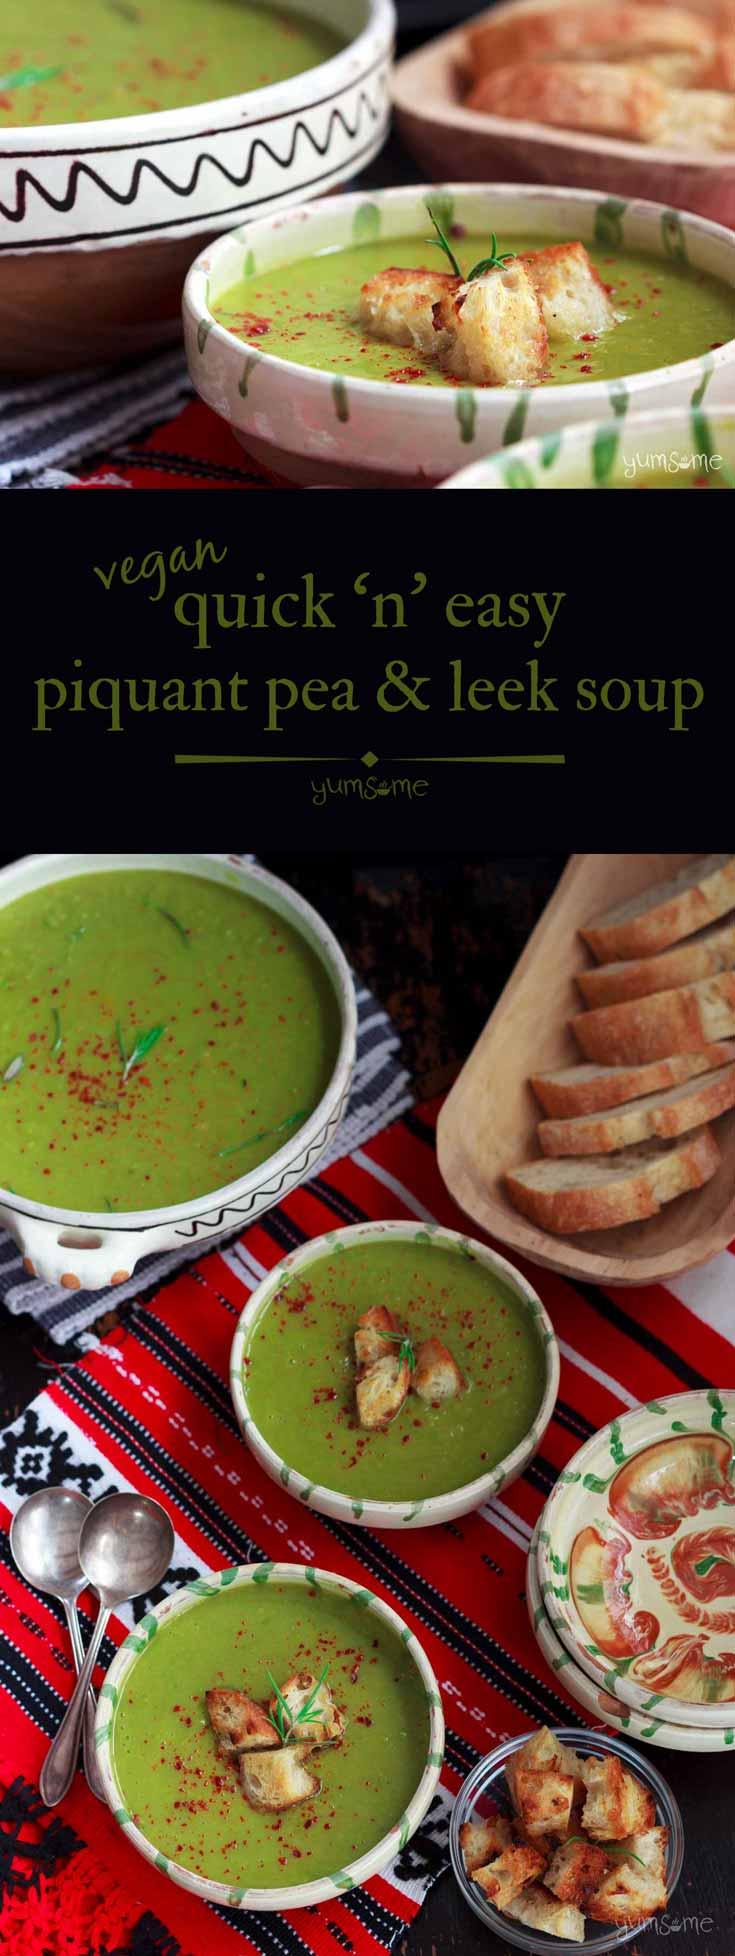 Quick \'n\' Easy Vegan Piquant Pea & Leek Soup